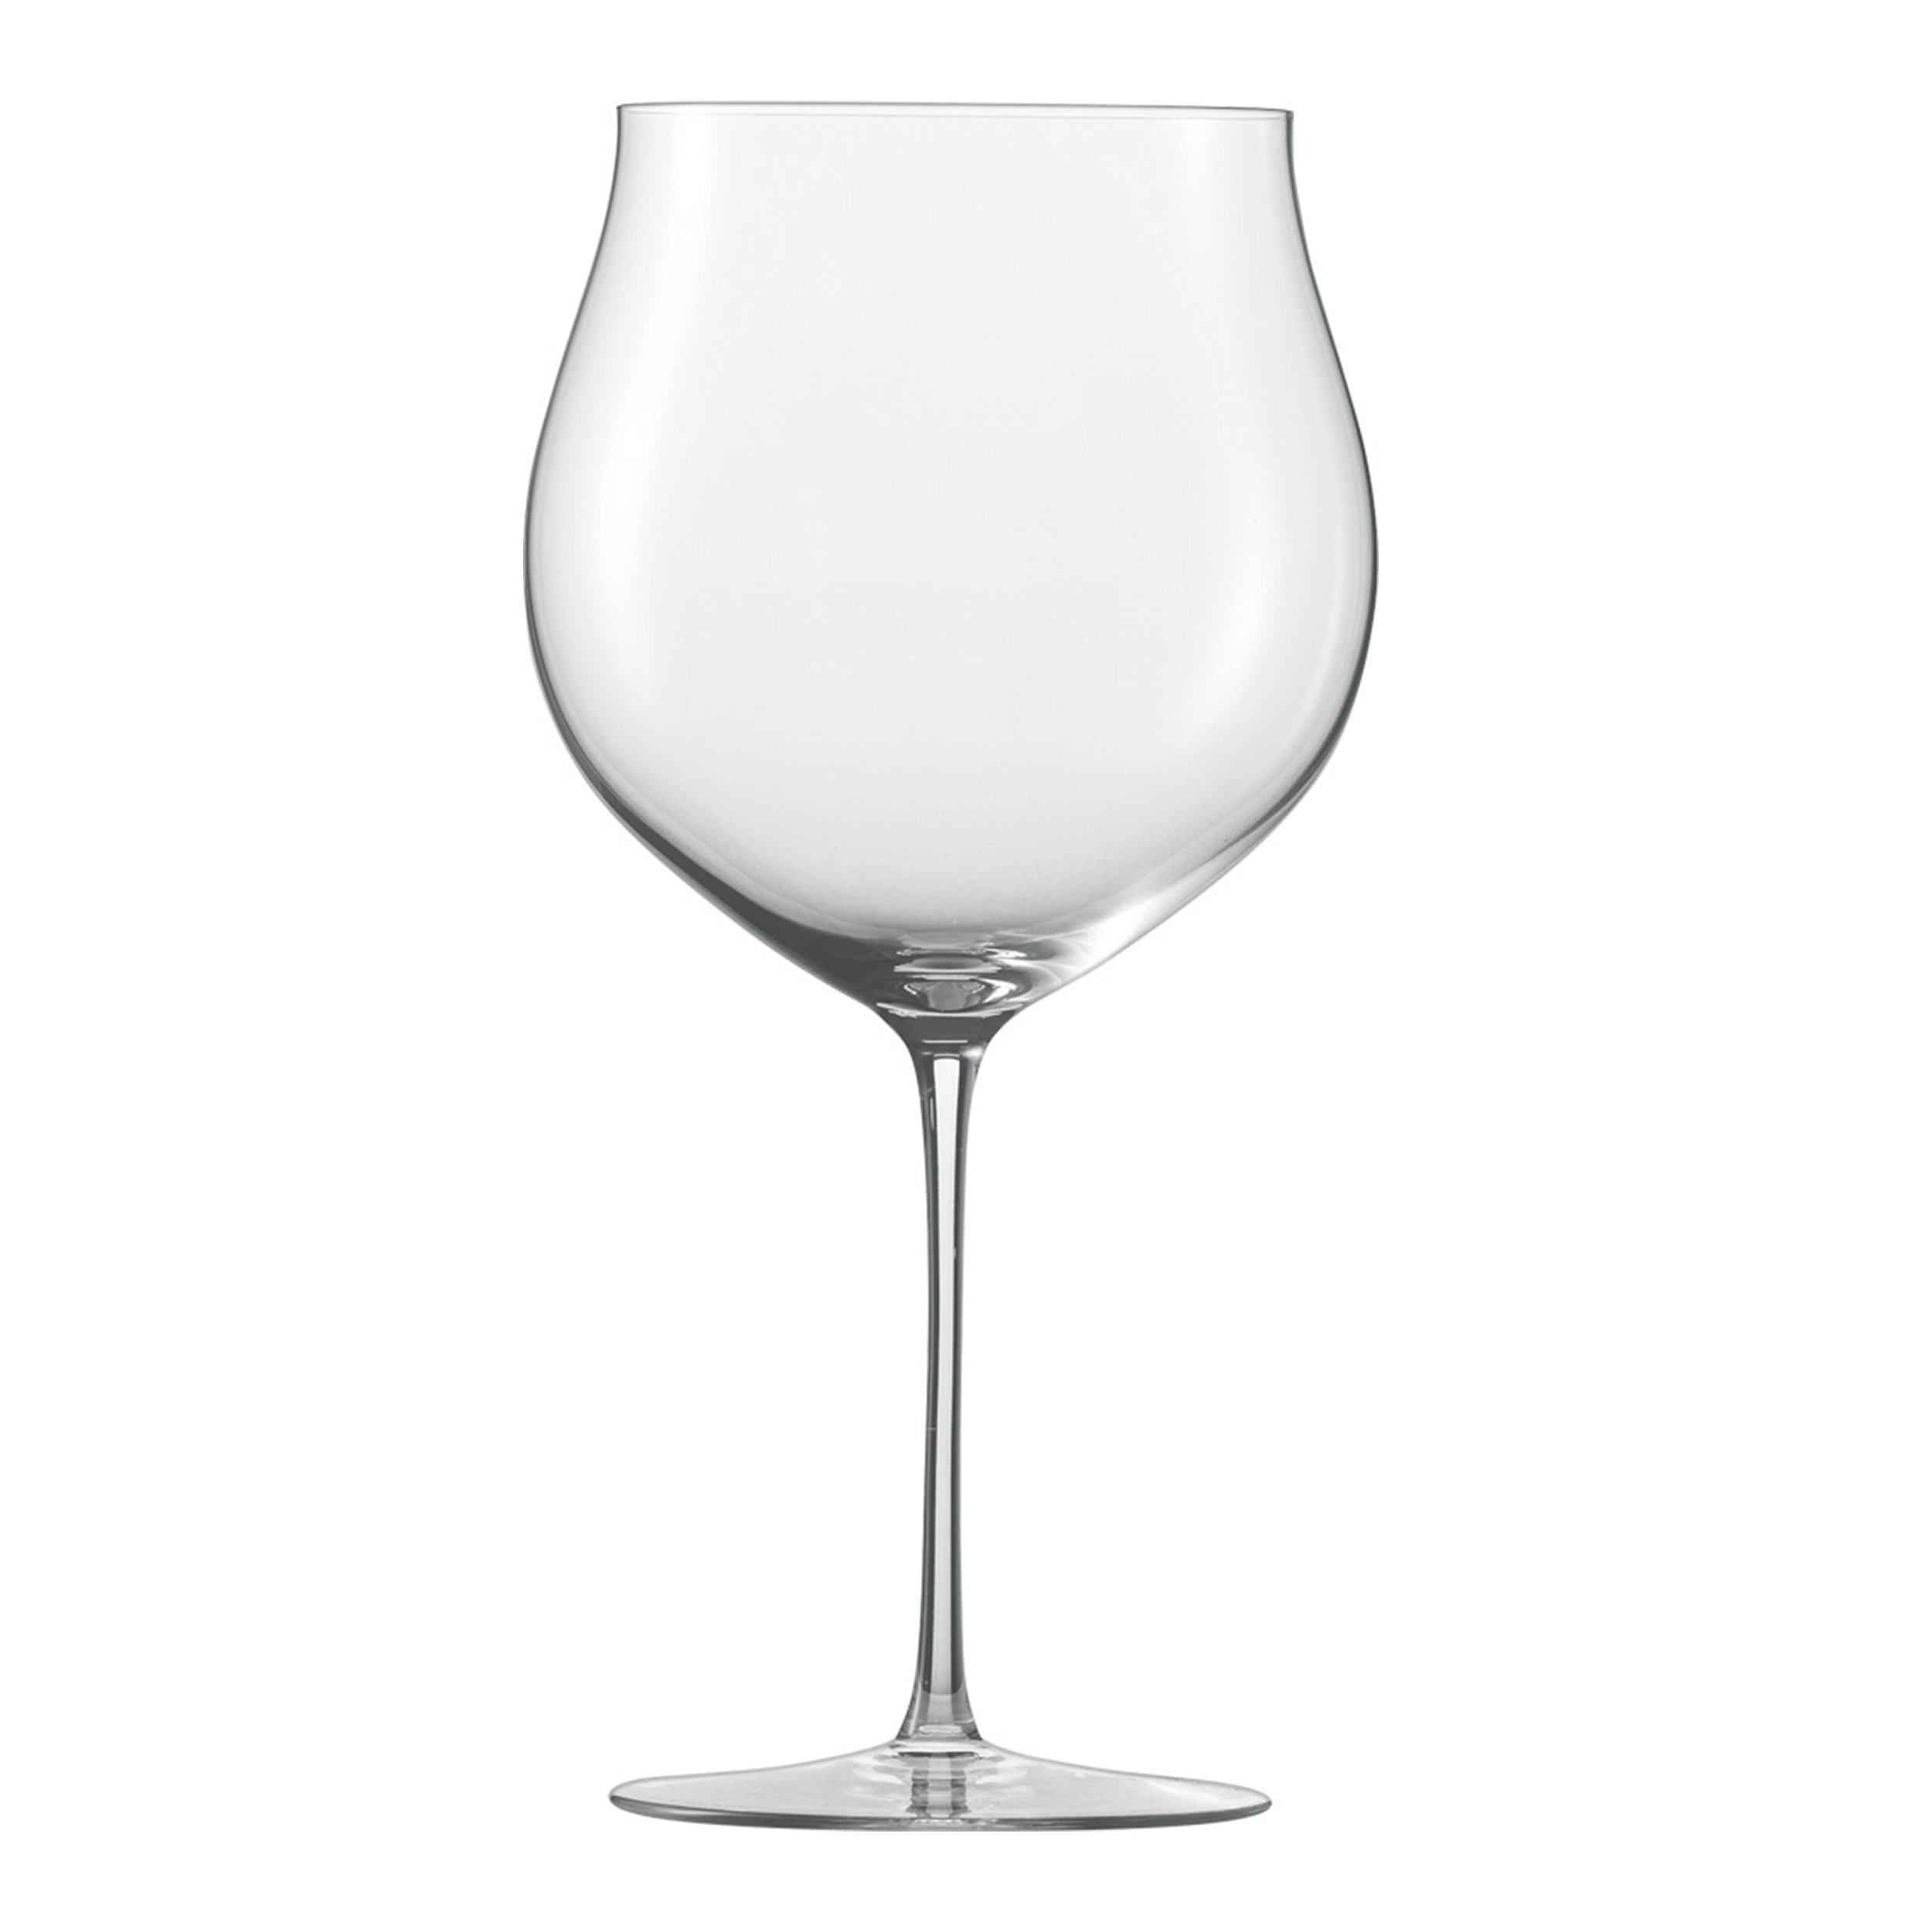 Zwiesel 1872 Burgundy Grand Cru, Set of 2, Enoteca, Shape 1295, Red Wine Glass, 962 ml, 111272 by Zwiesel 1872